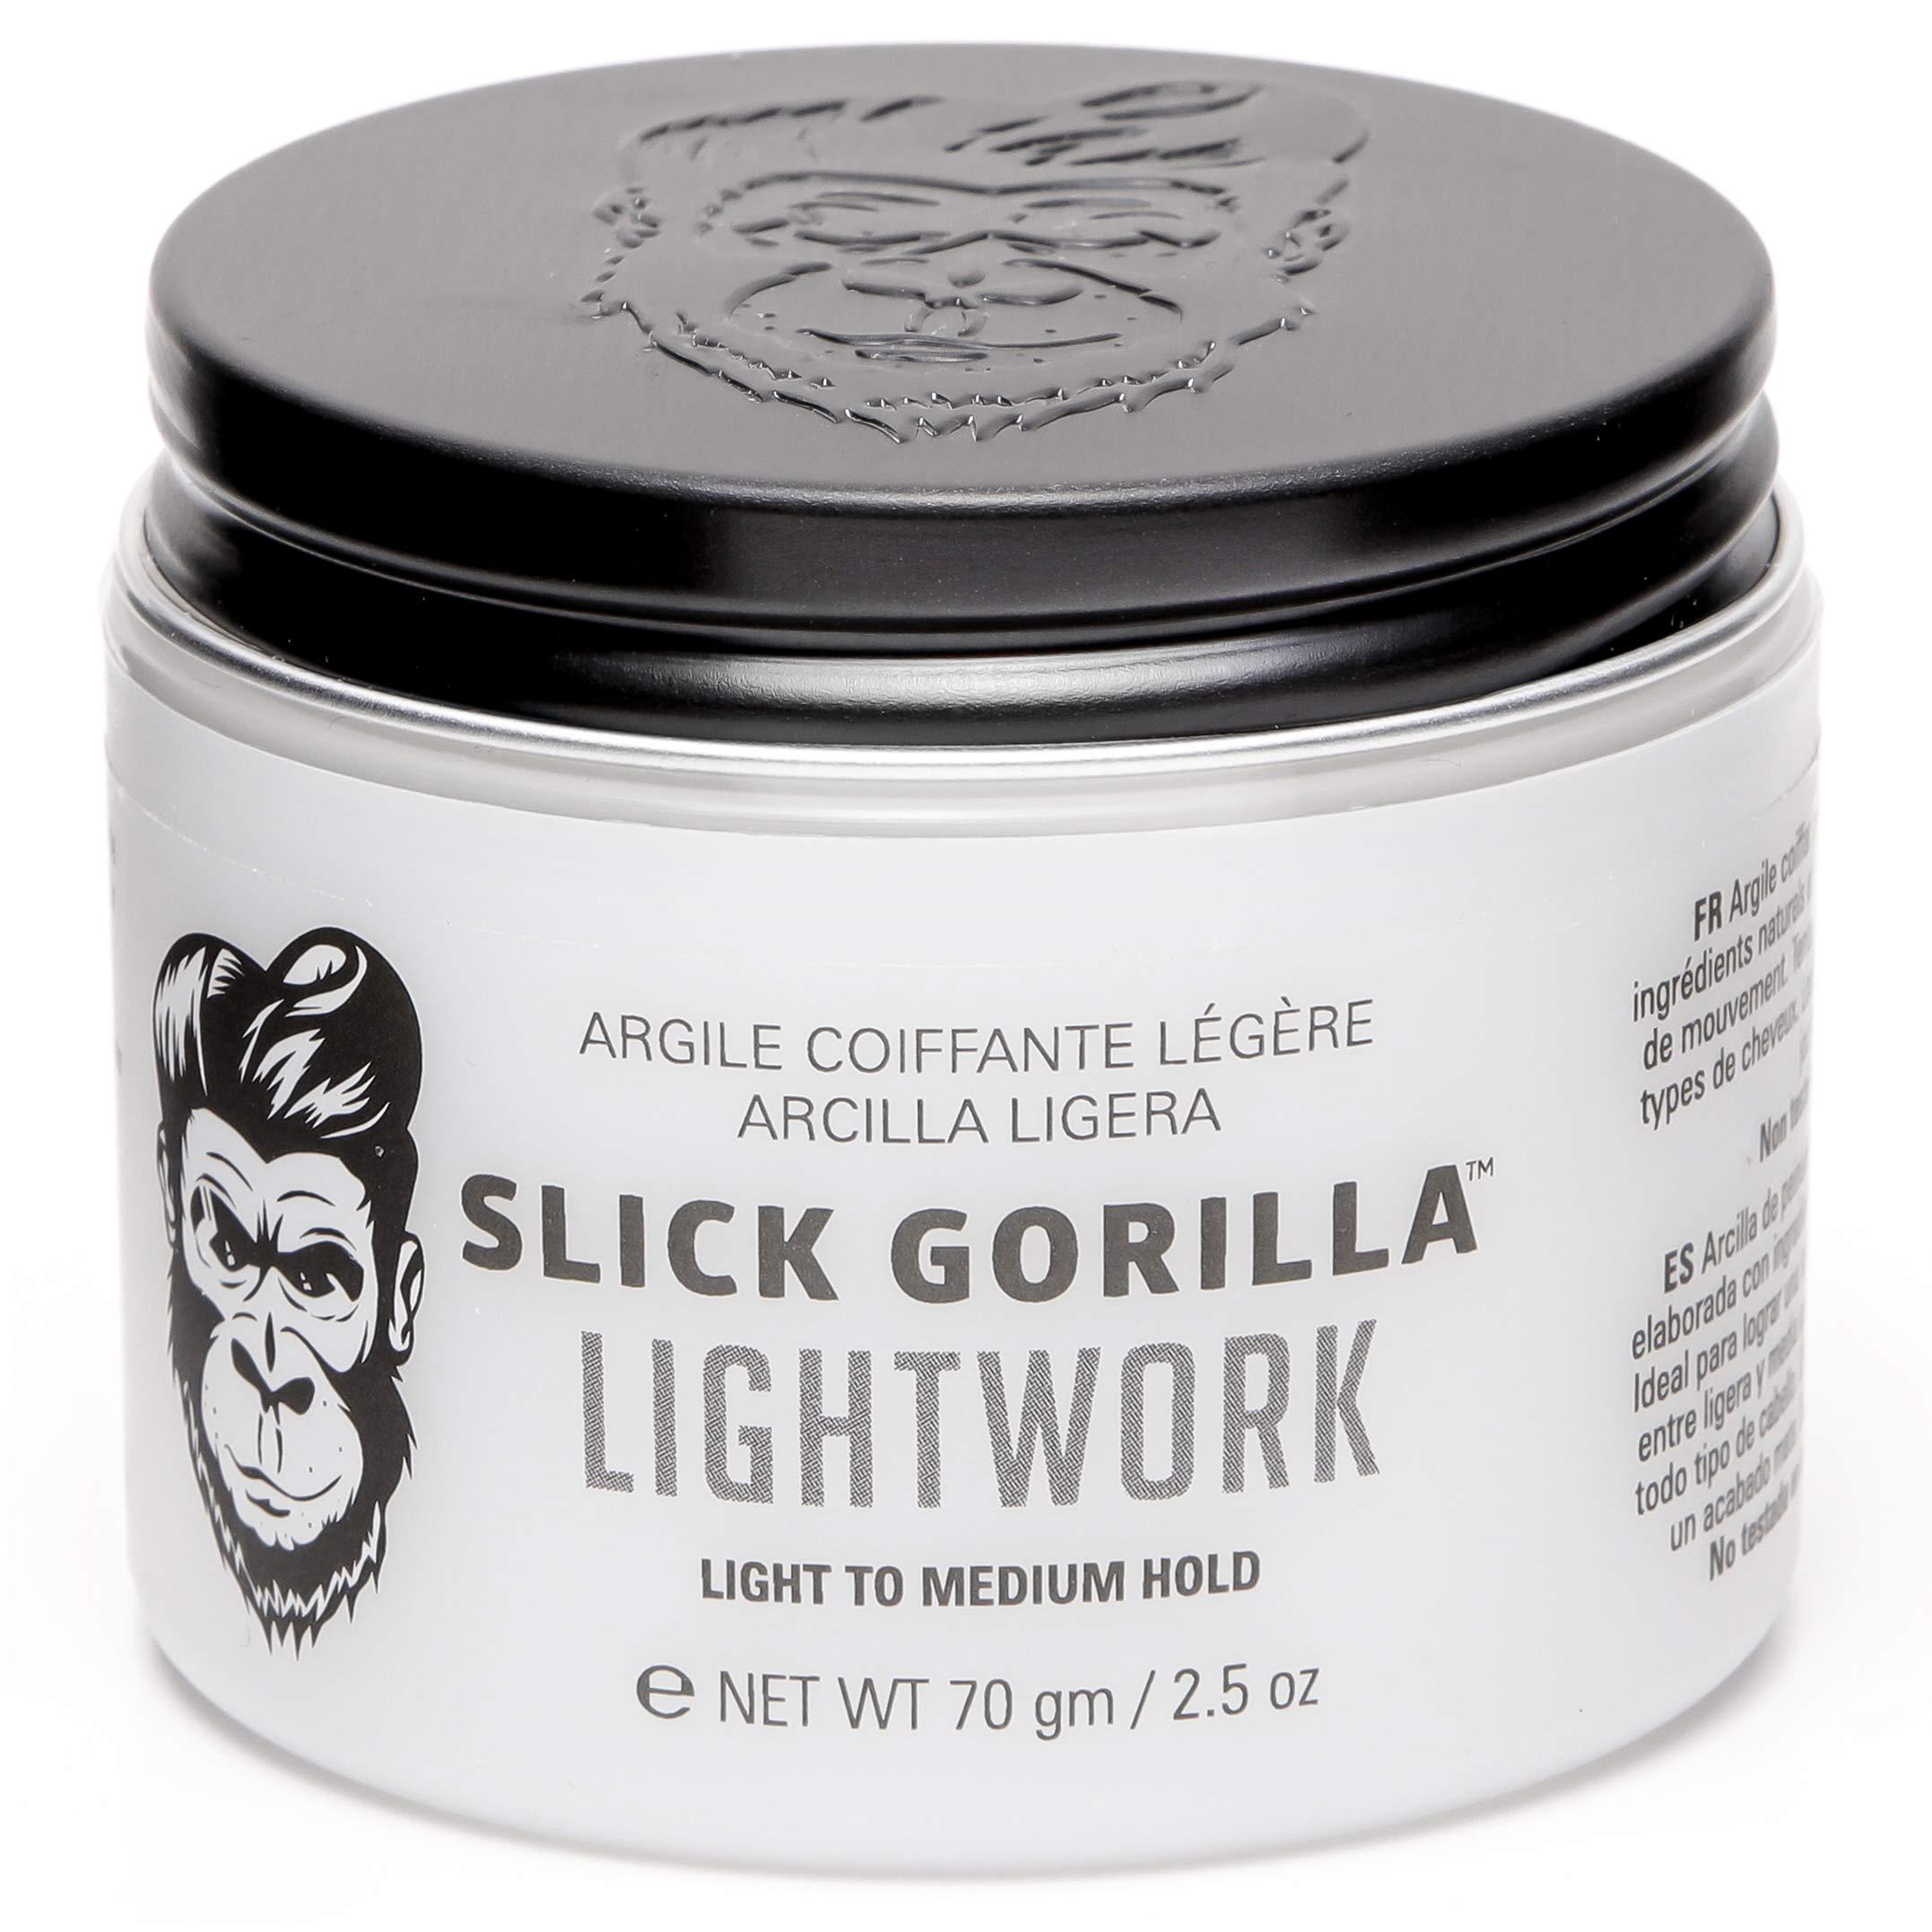 Slick Gorilla Lightwork Hair Styling Clay 70g